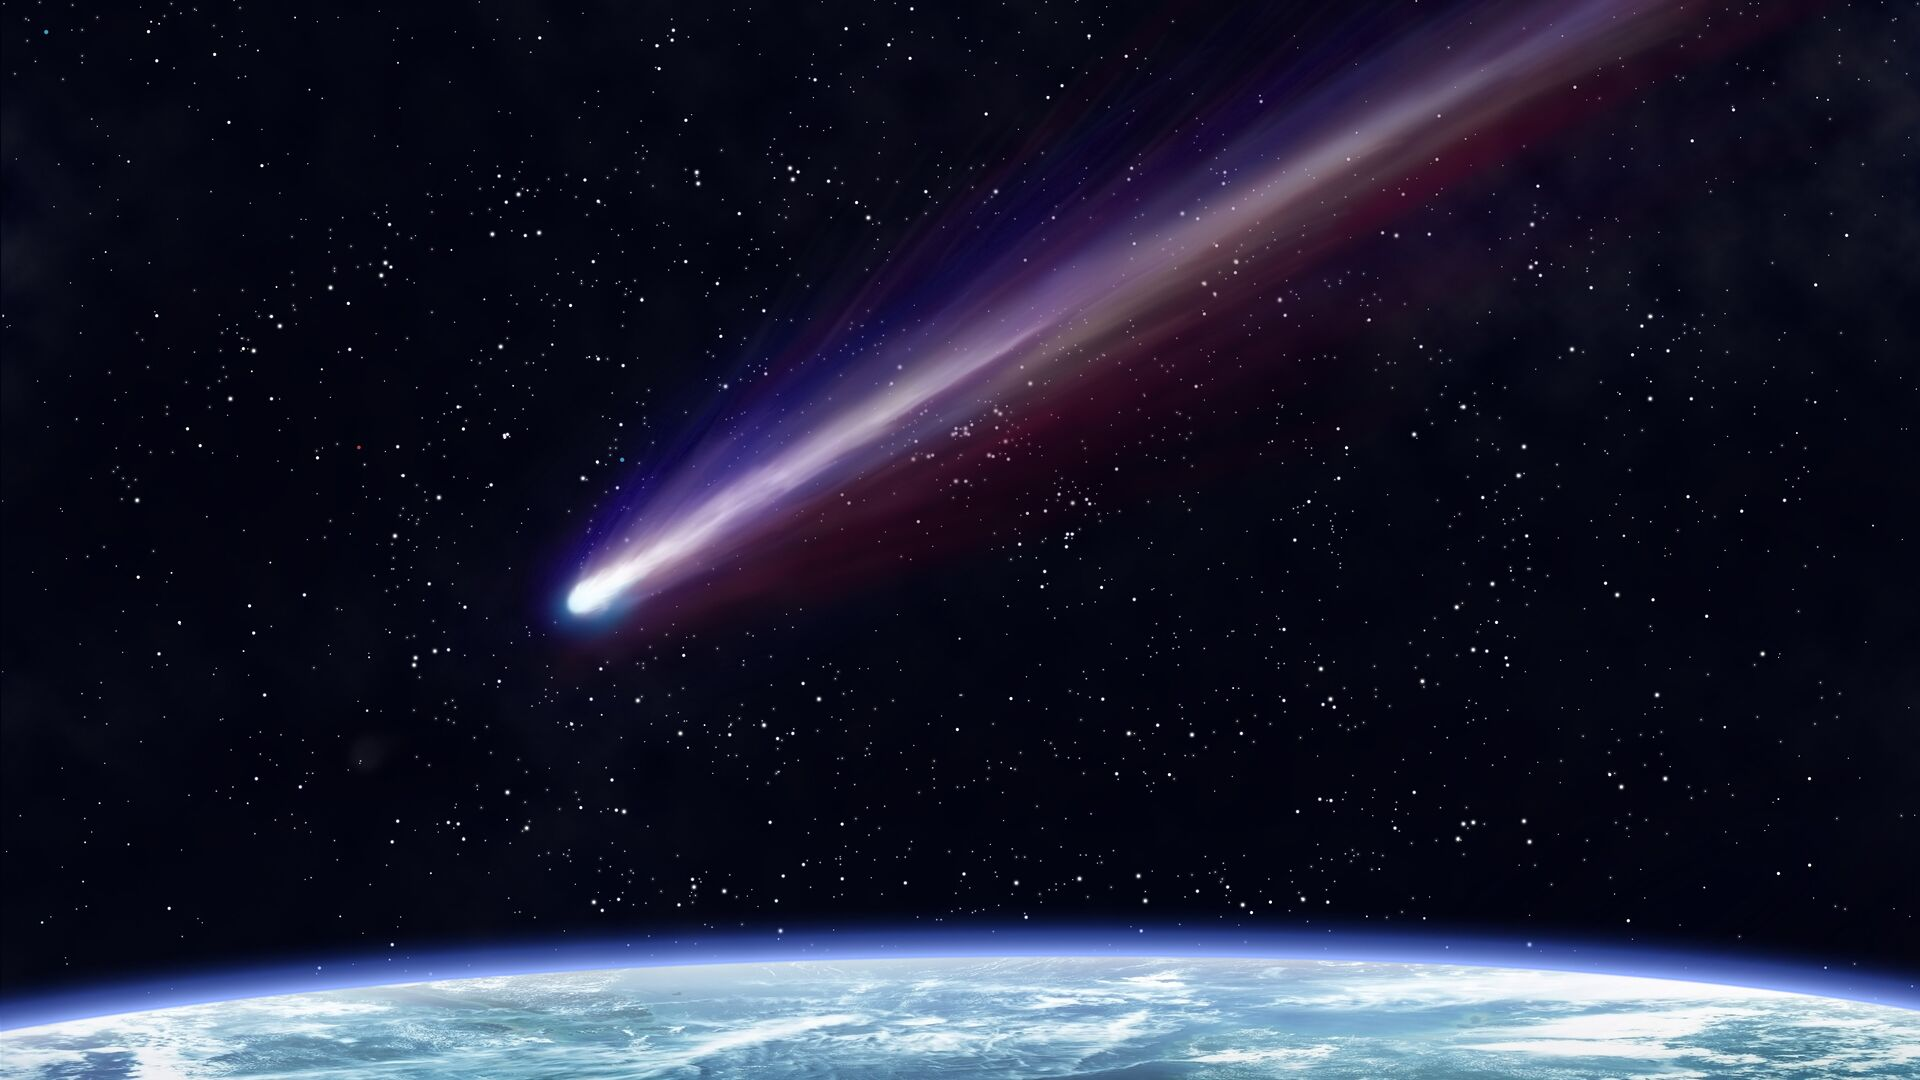 Комета около Земли - РИА Новости, 1920, 10.02.2021